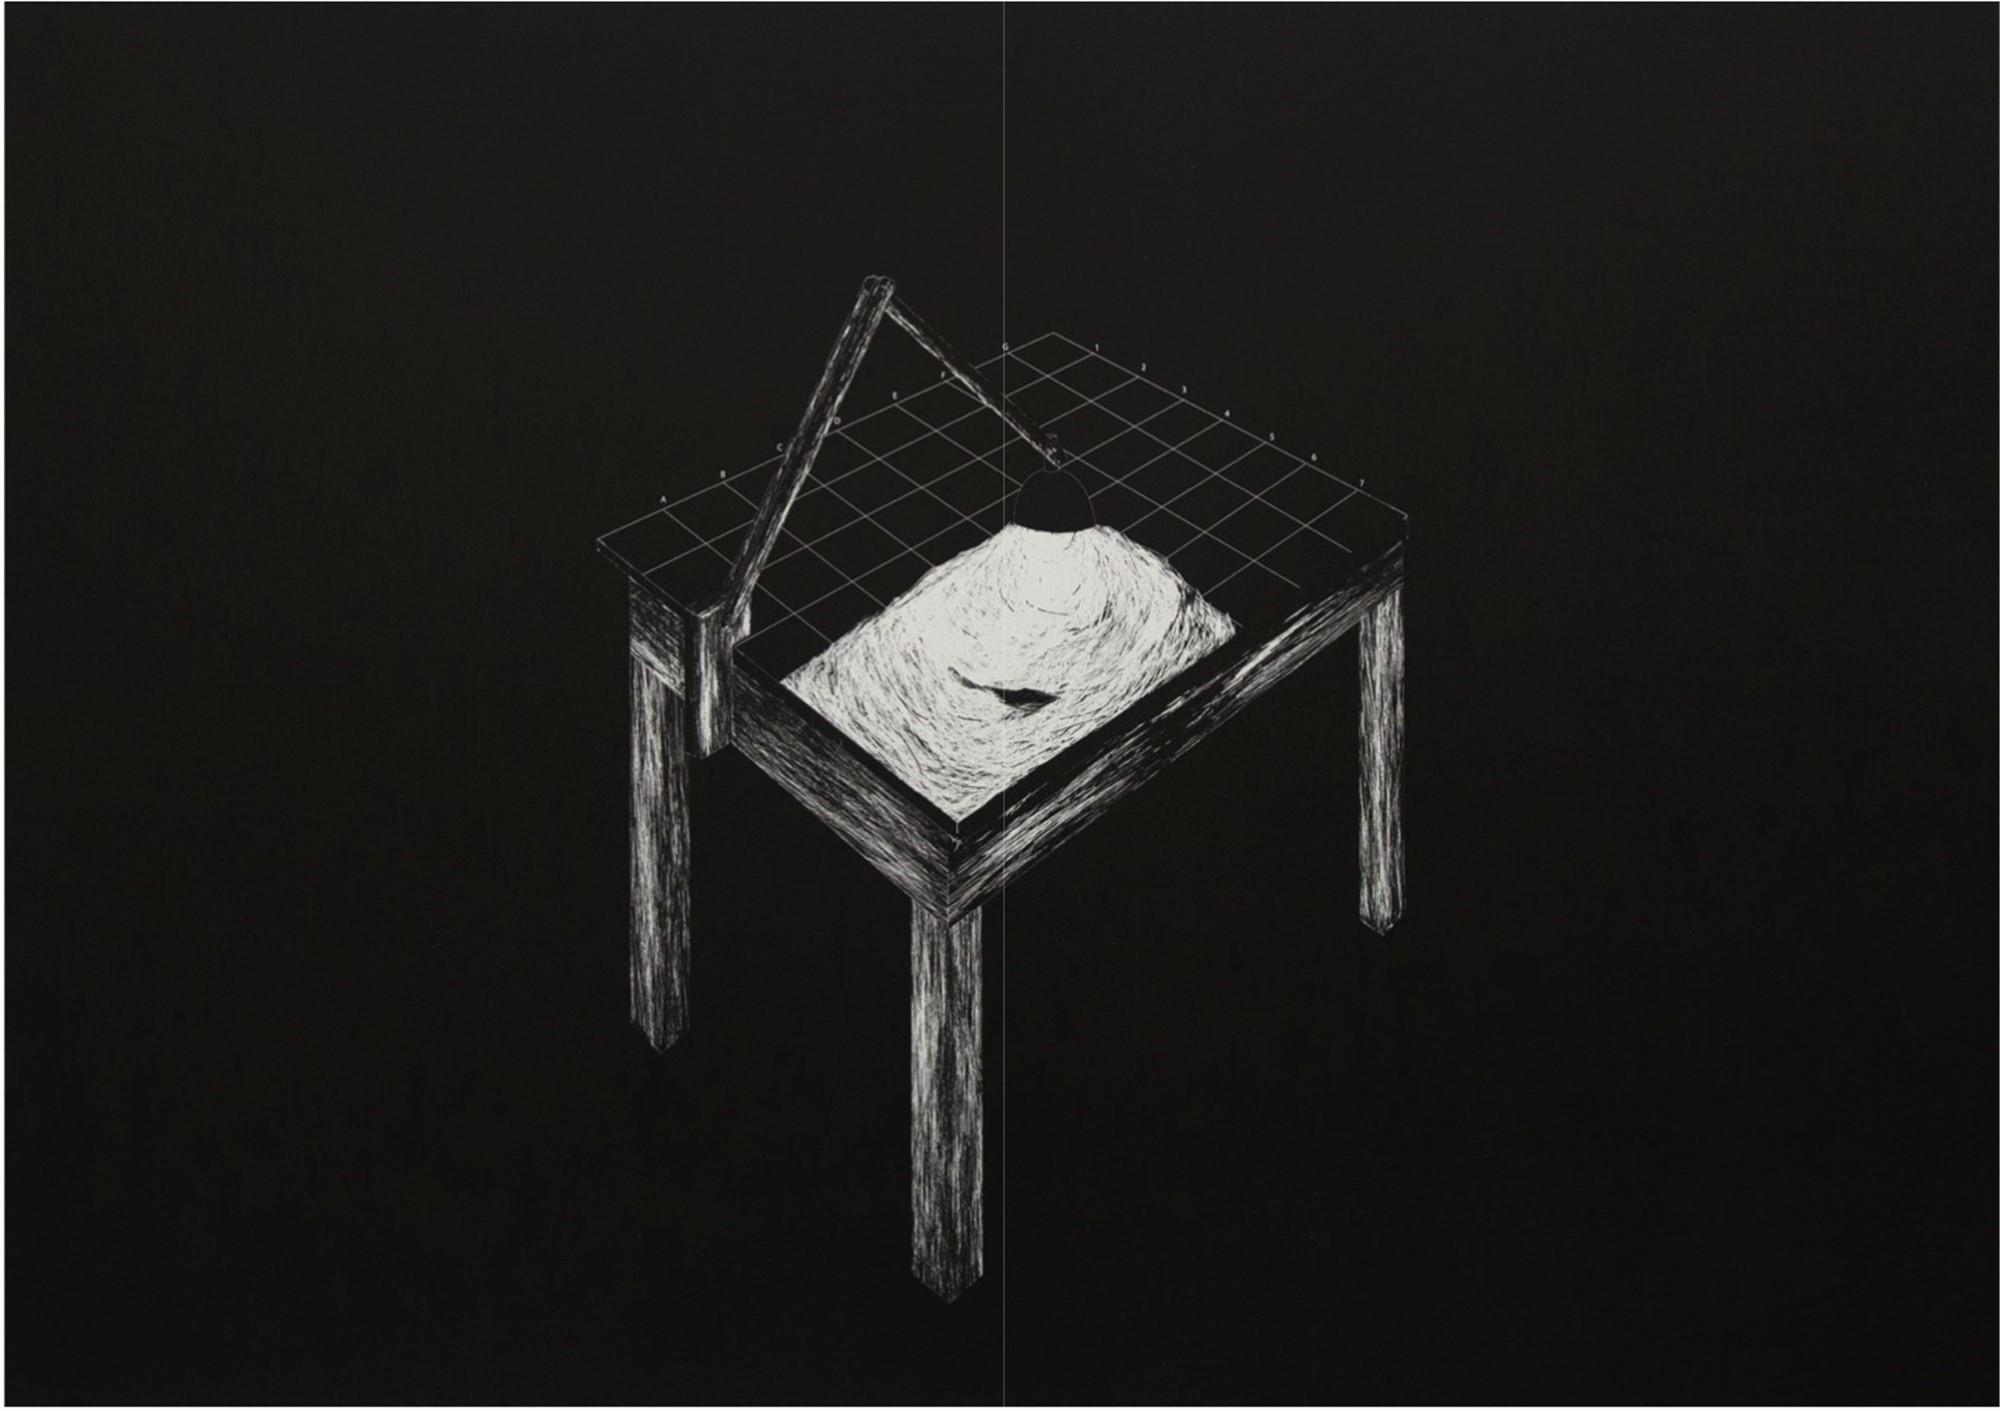 Desapropriaçâo 1 by André Komatsu